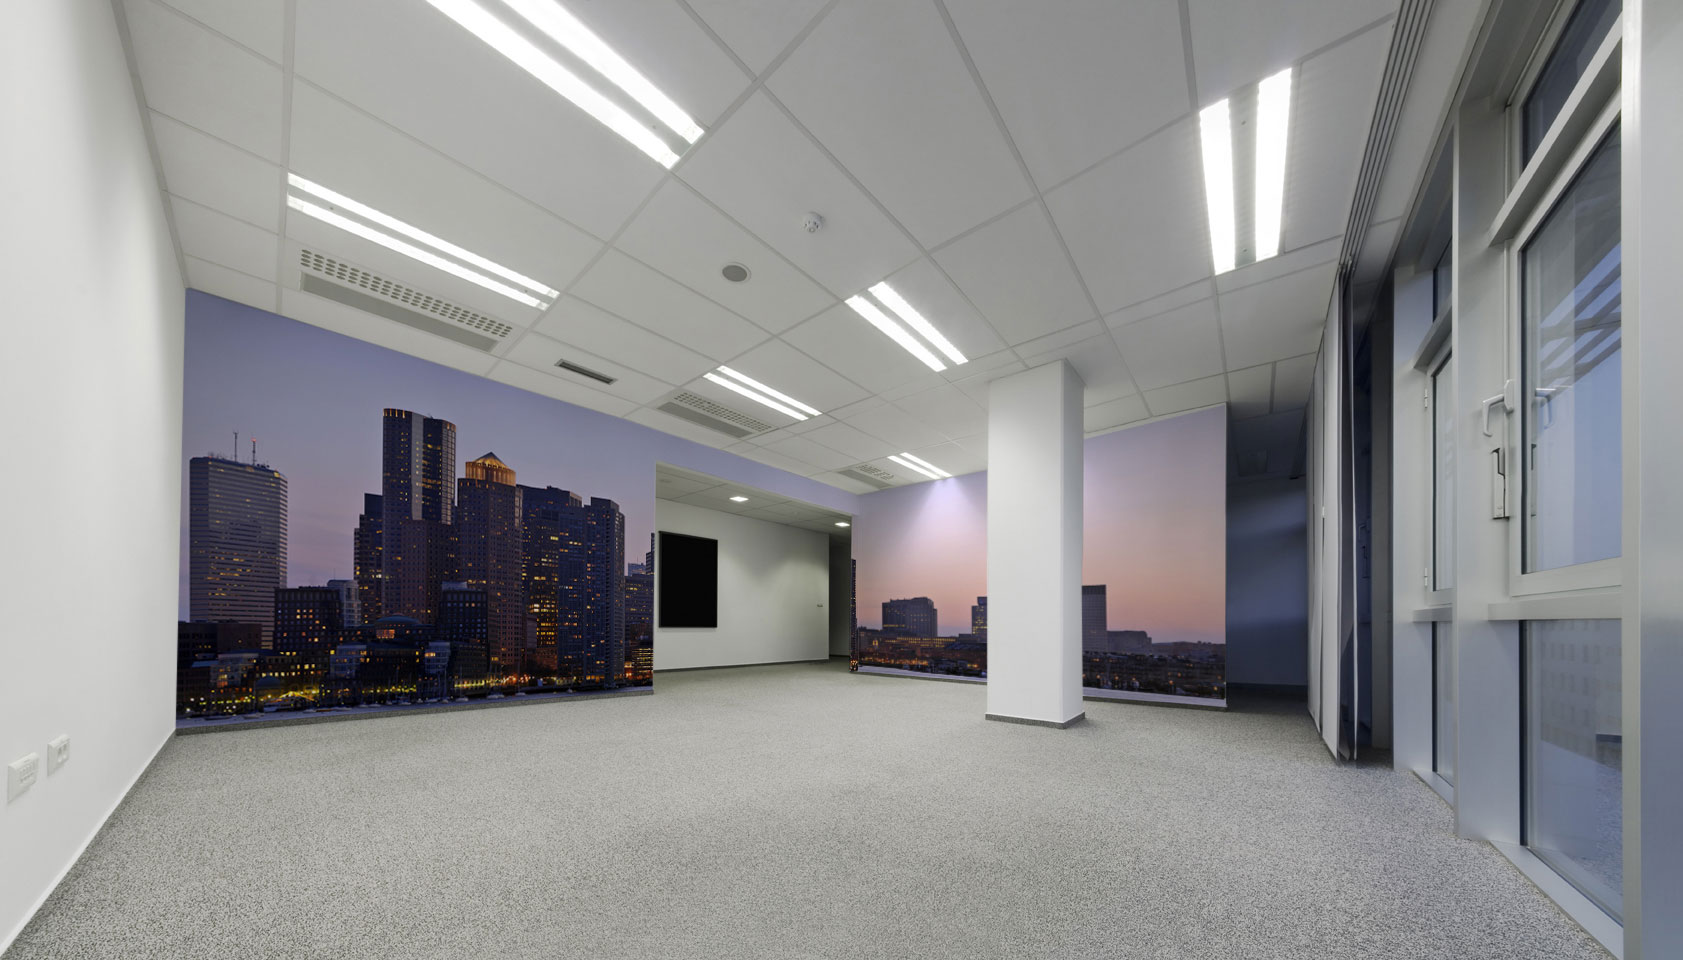 Wall Mural - Companies Design